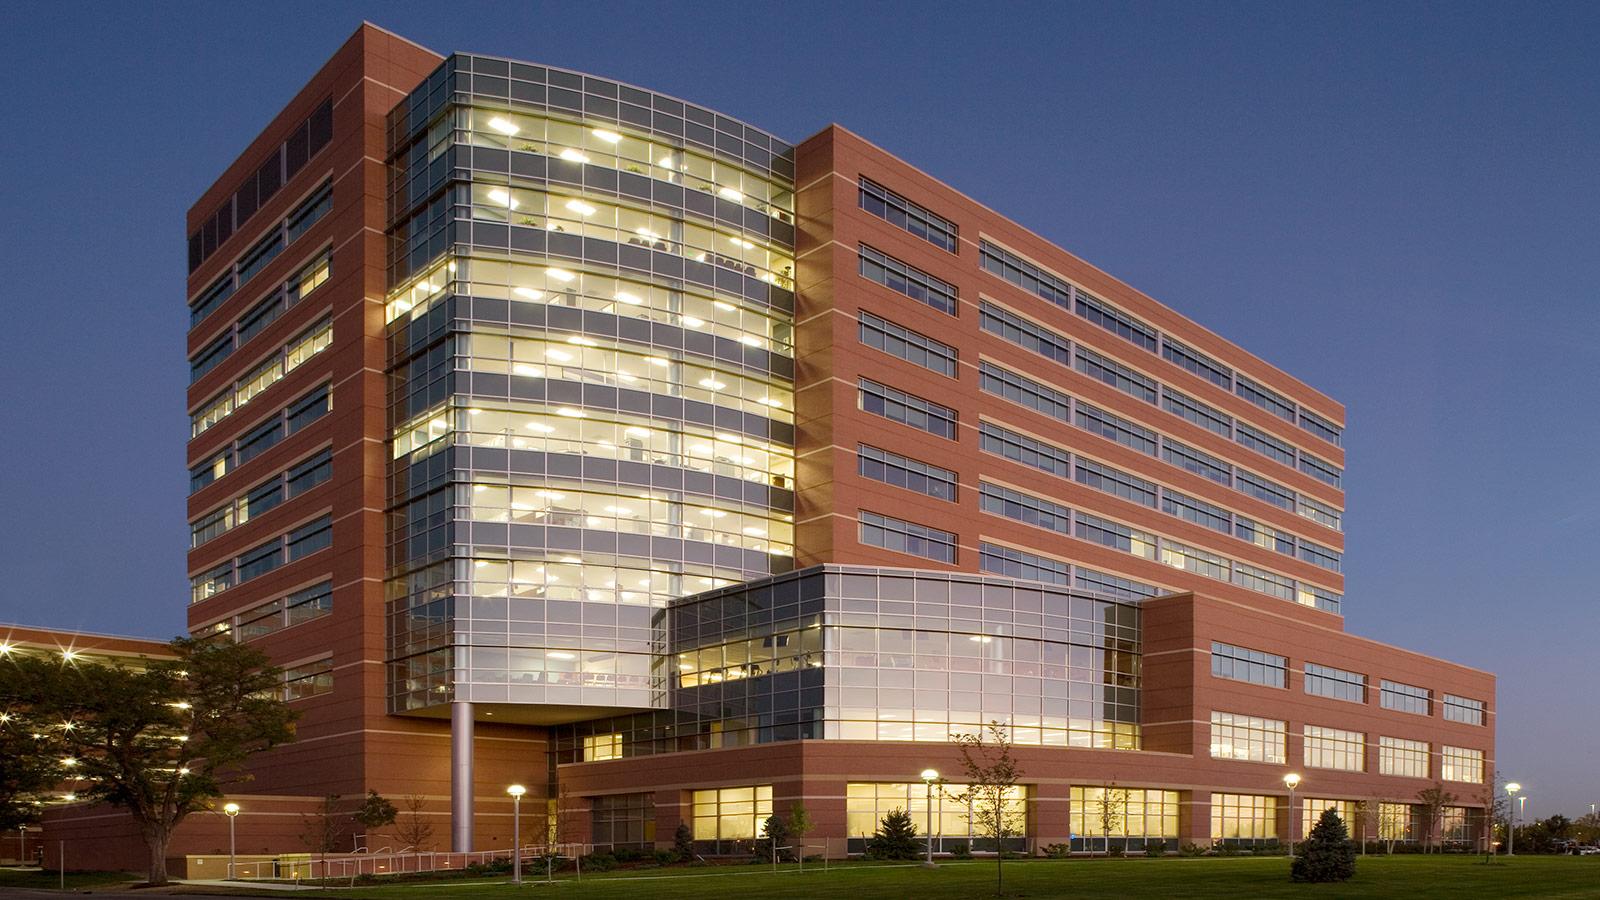 University Of Colorado Hospital Anschutz Medical Campus Leprino Office Building Davis